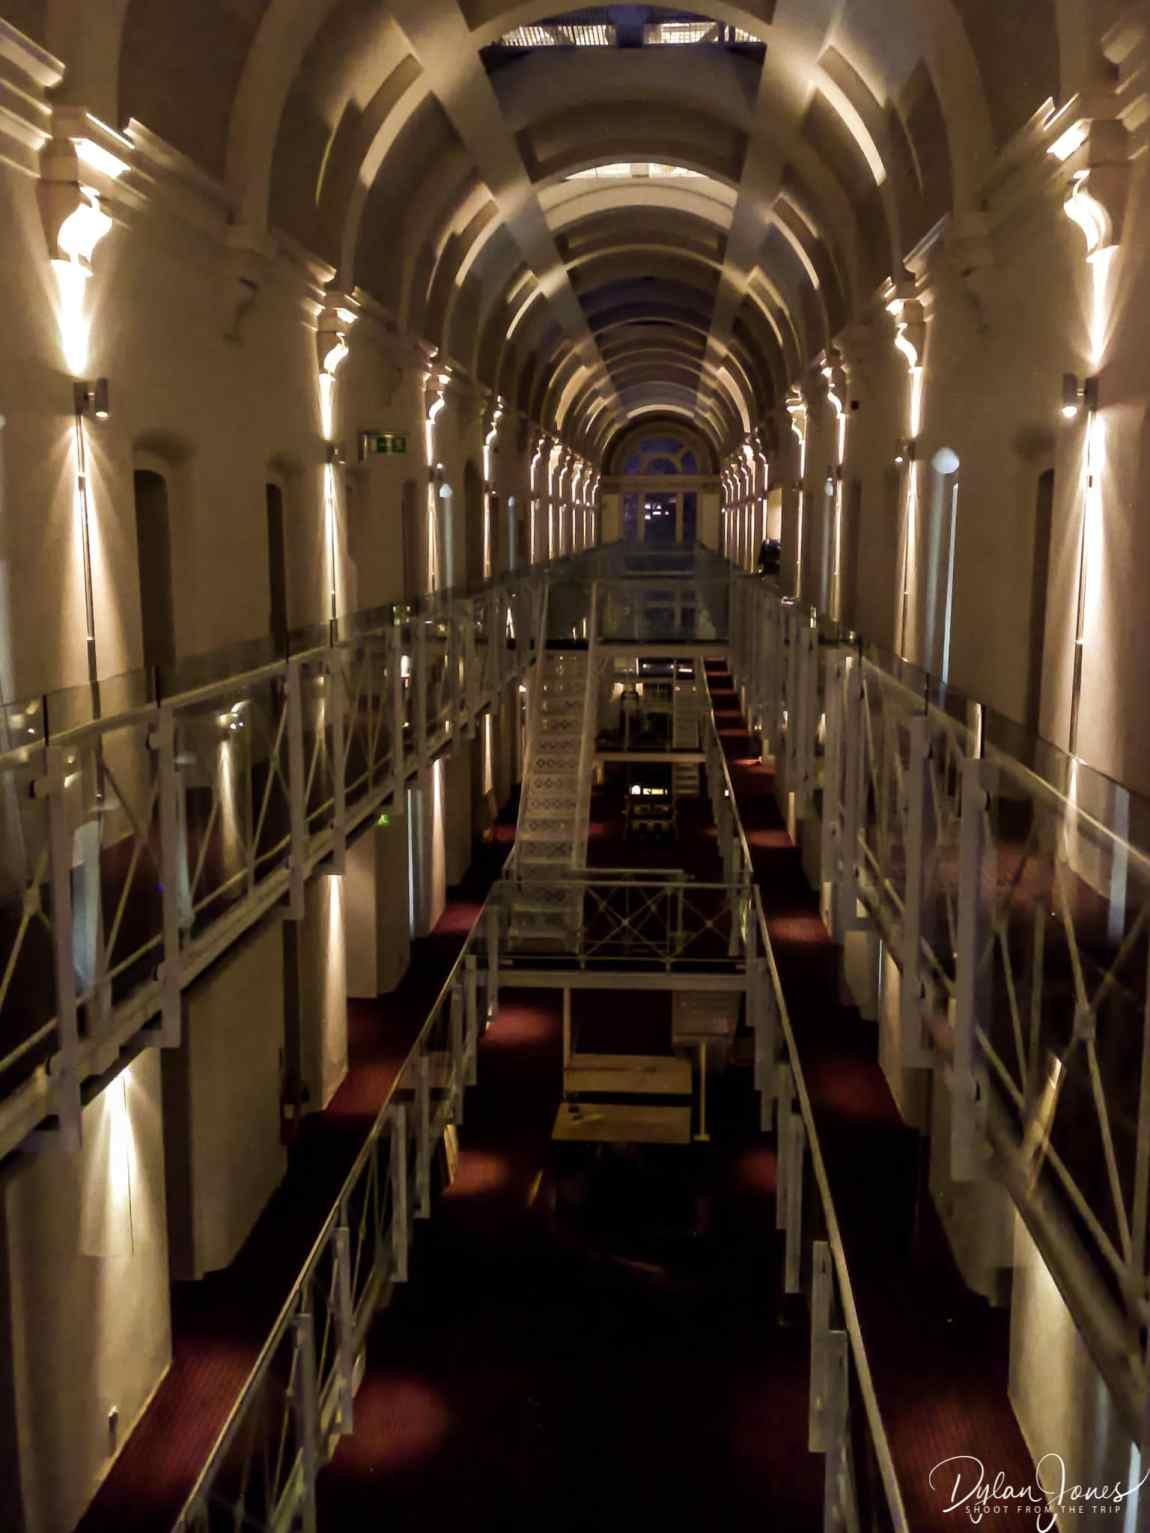 The cell block of Malmaison Oxford